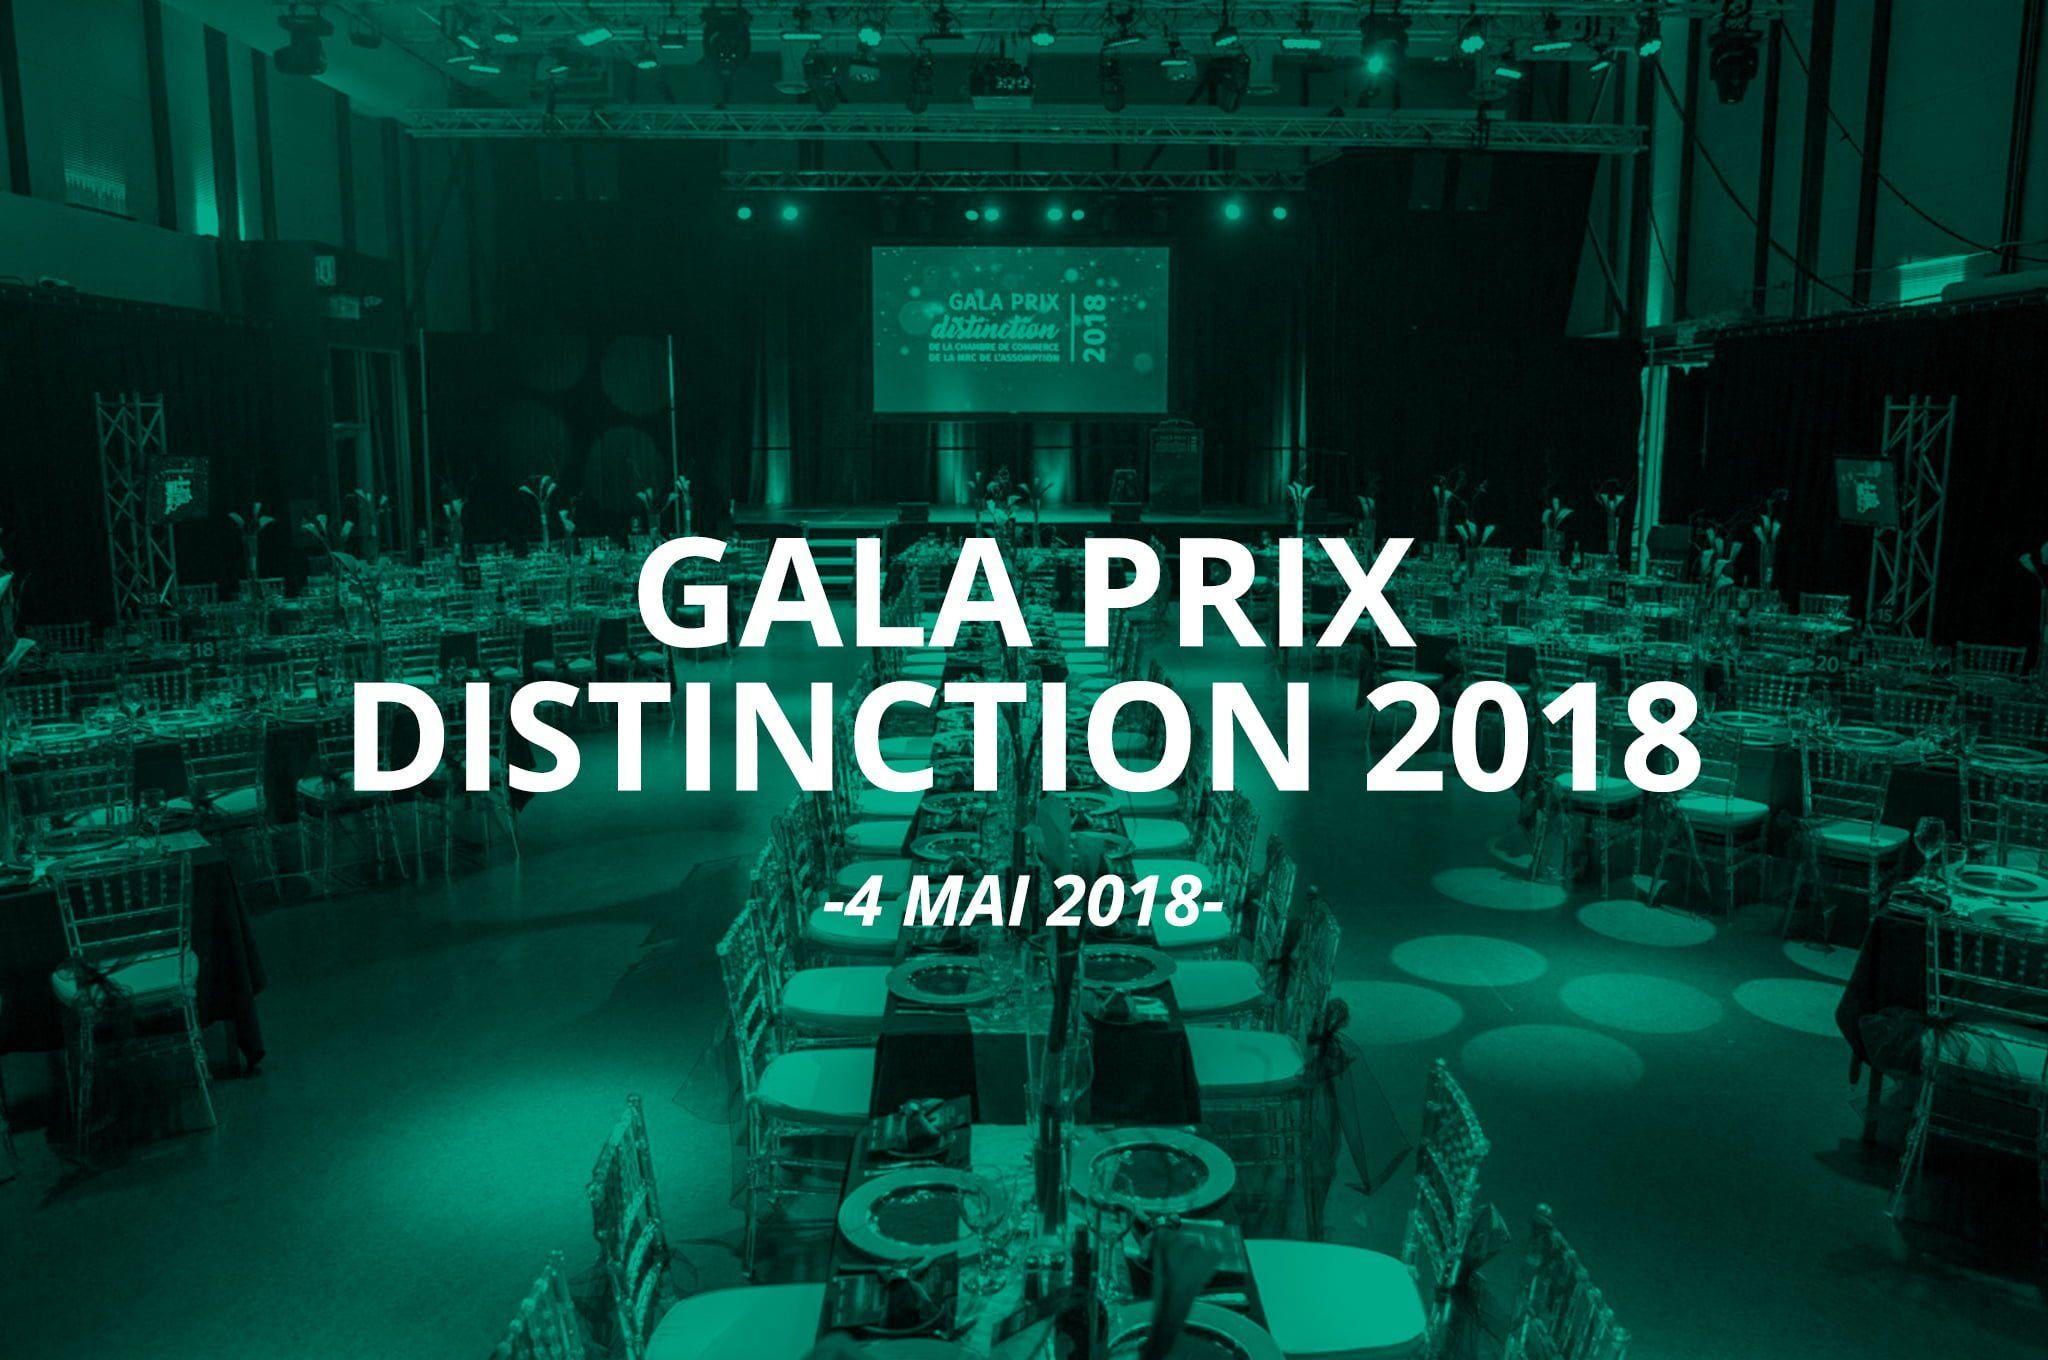 Gala Prix Dinstinction 2018